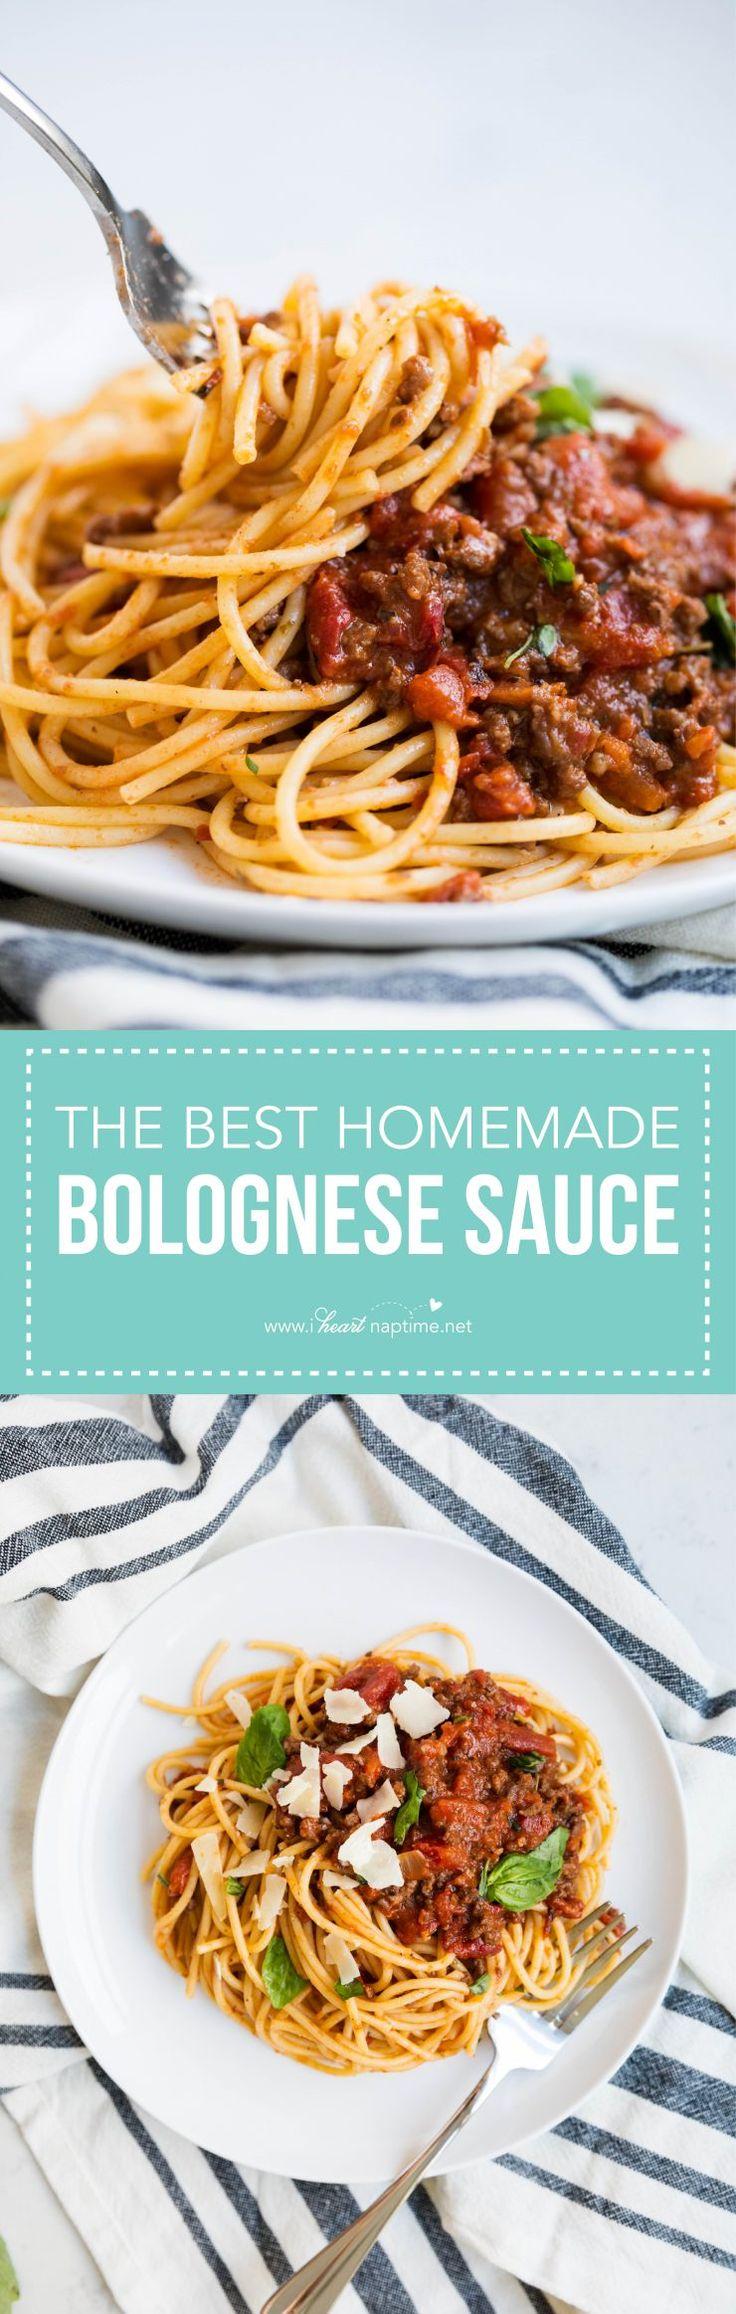 896 best Pastalicious images on Pinterest | Baked pasta recipes ...